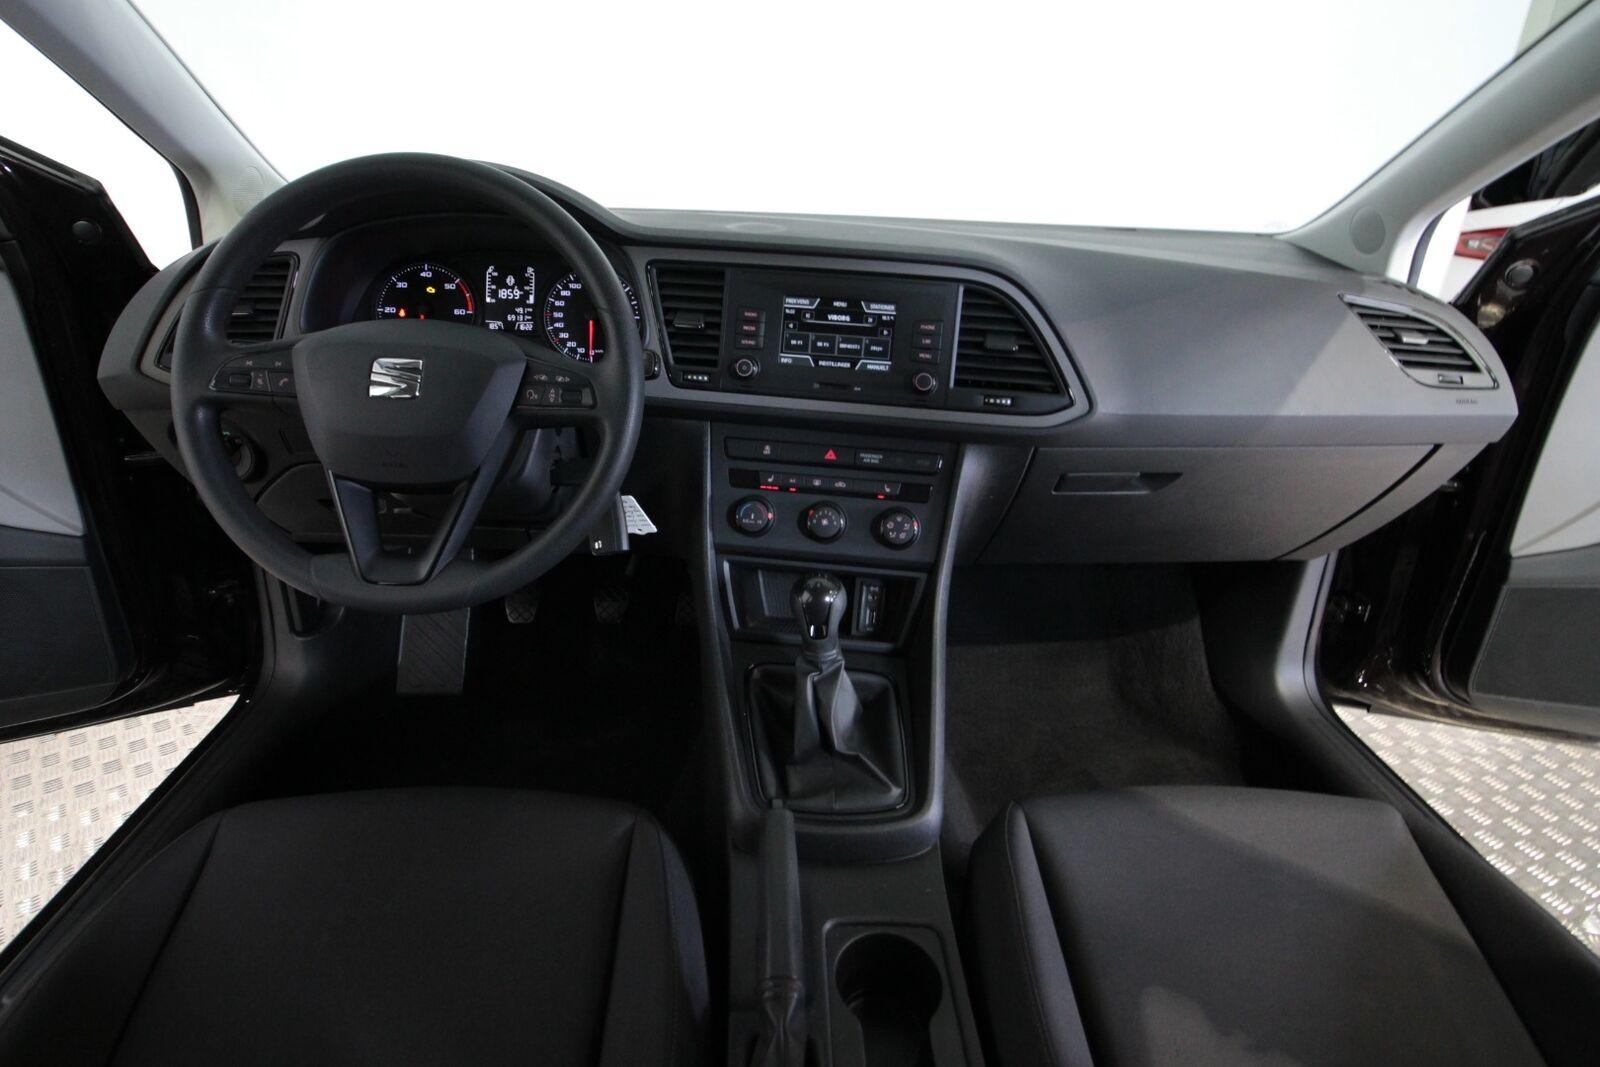 Seat Leon TDi 115 Reference ST